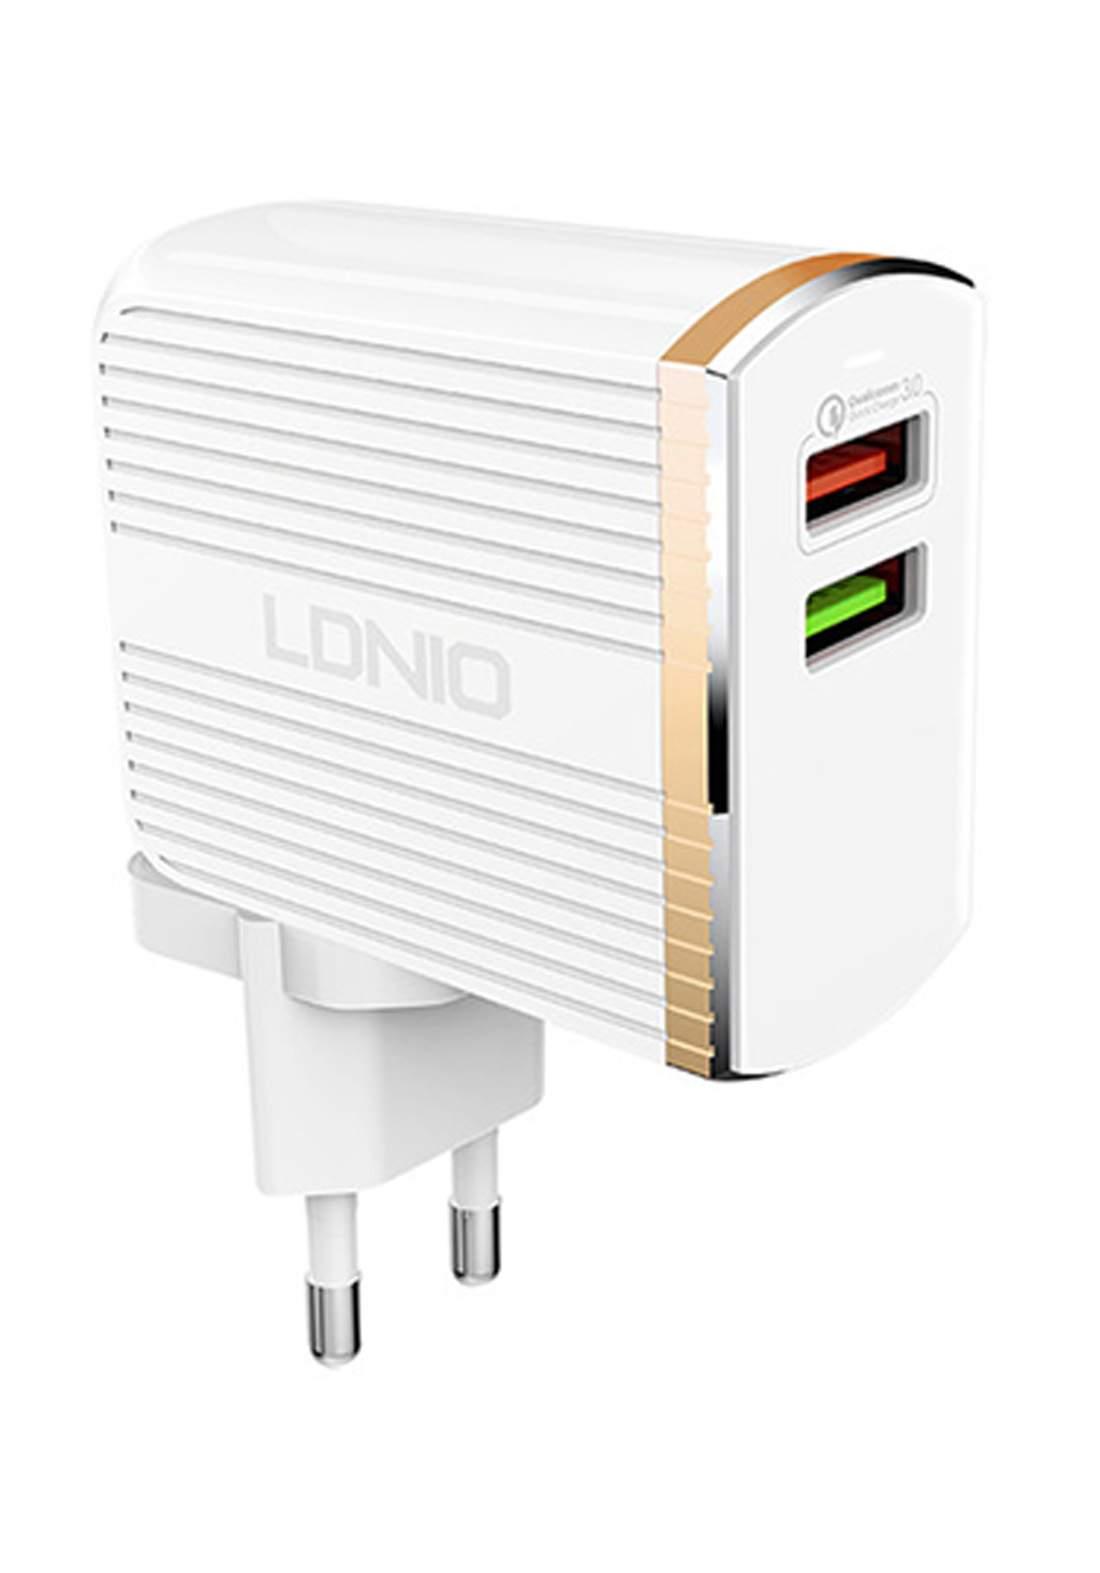 Ldnio A2502q Convert Design Travel Charger-White